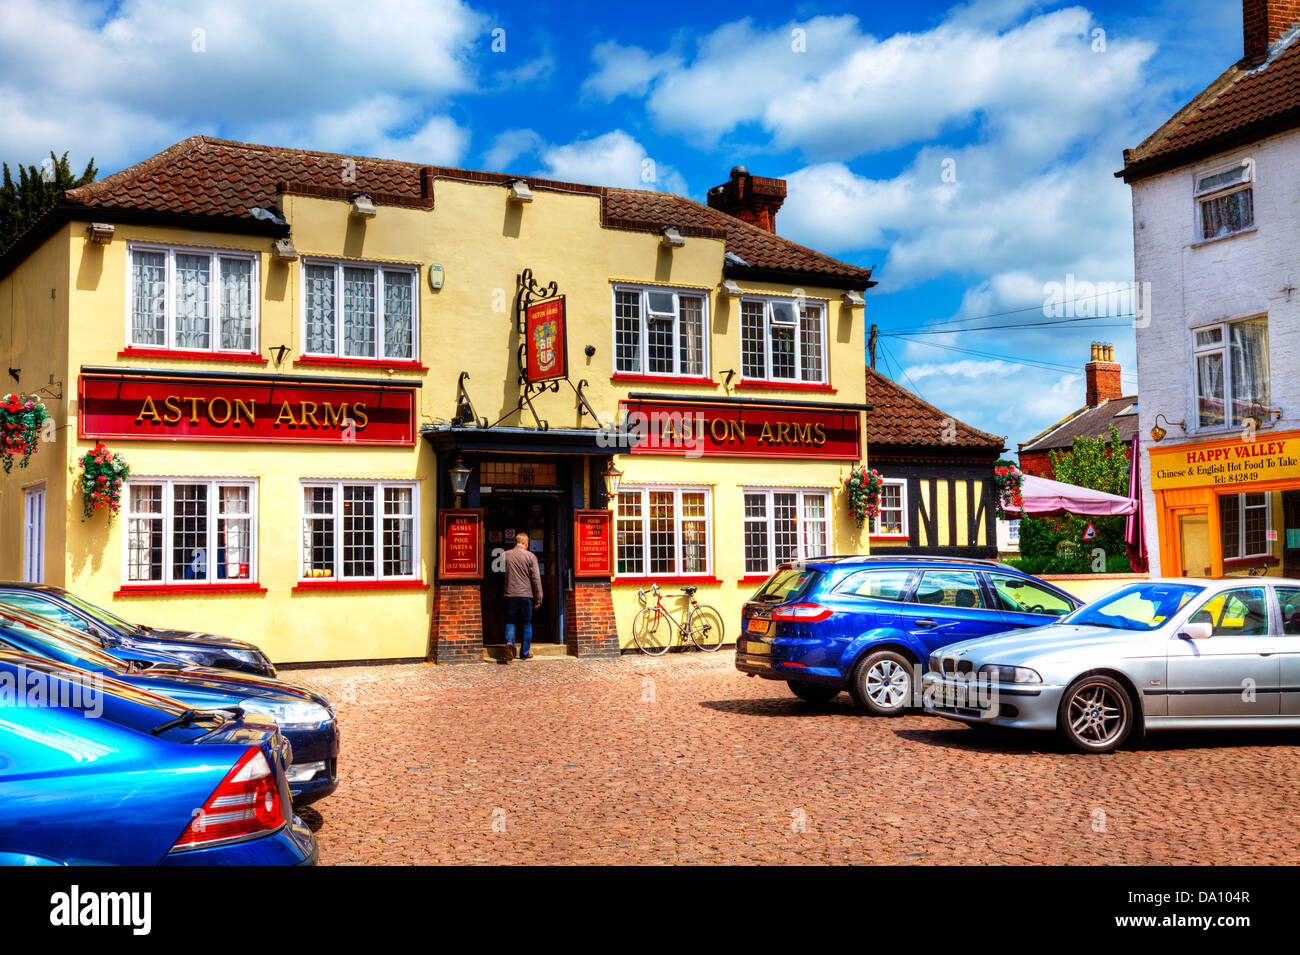 man walking into Aston Arms pub, Market Rasen town village centre, Lincolnshire, UK, England - Stock Image